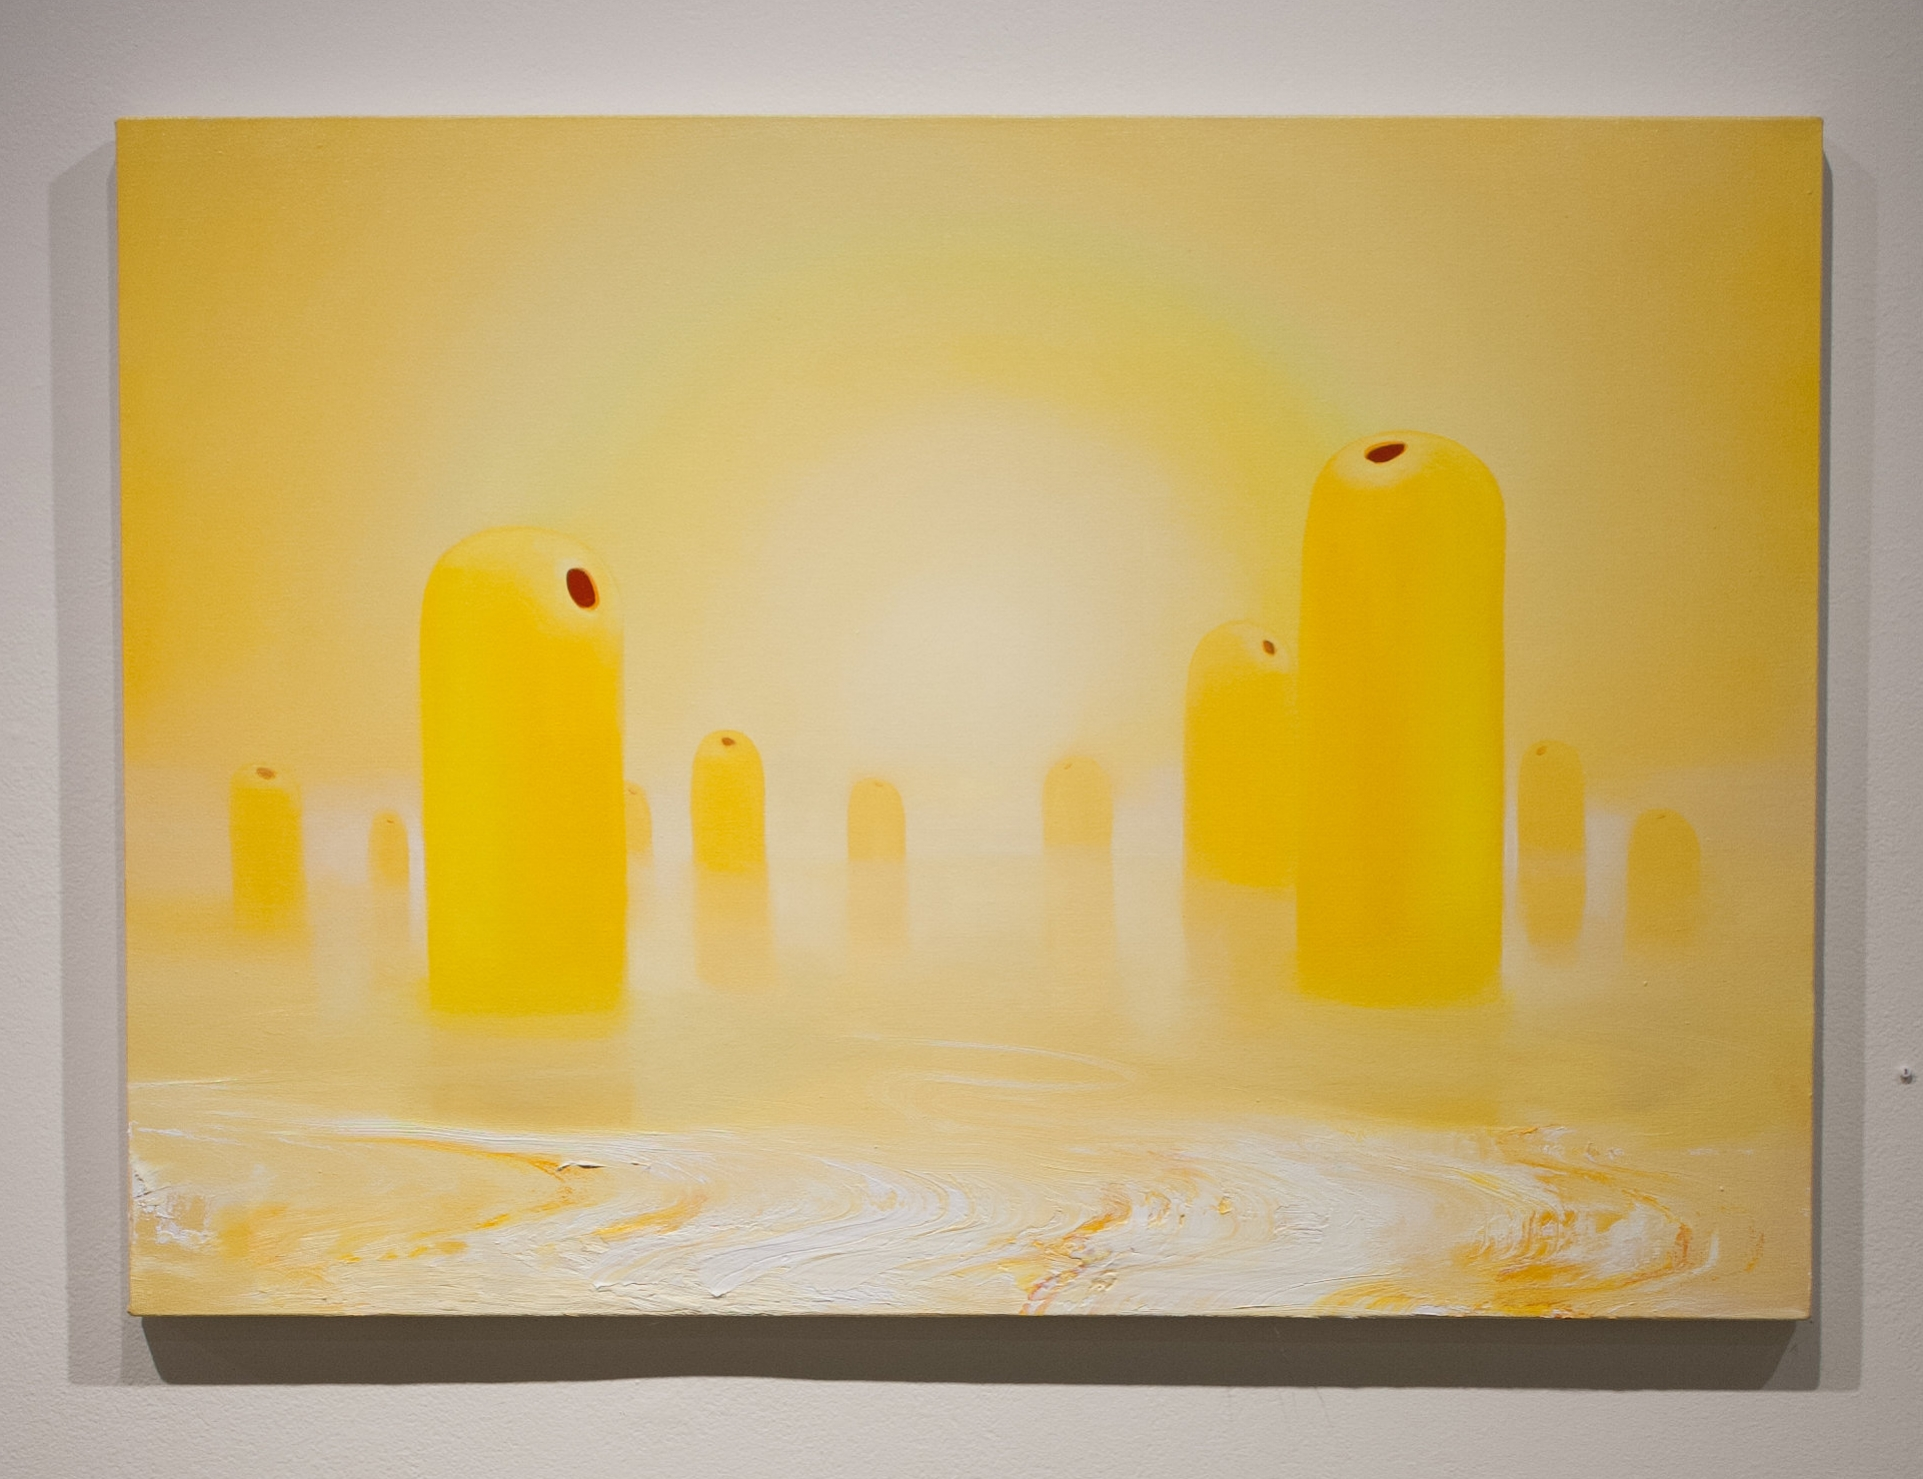 Conor Fagan   Menhir   2018   oil on canvas   31 x 44 in.